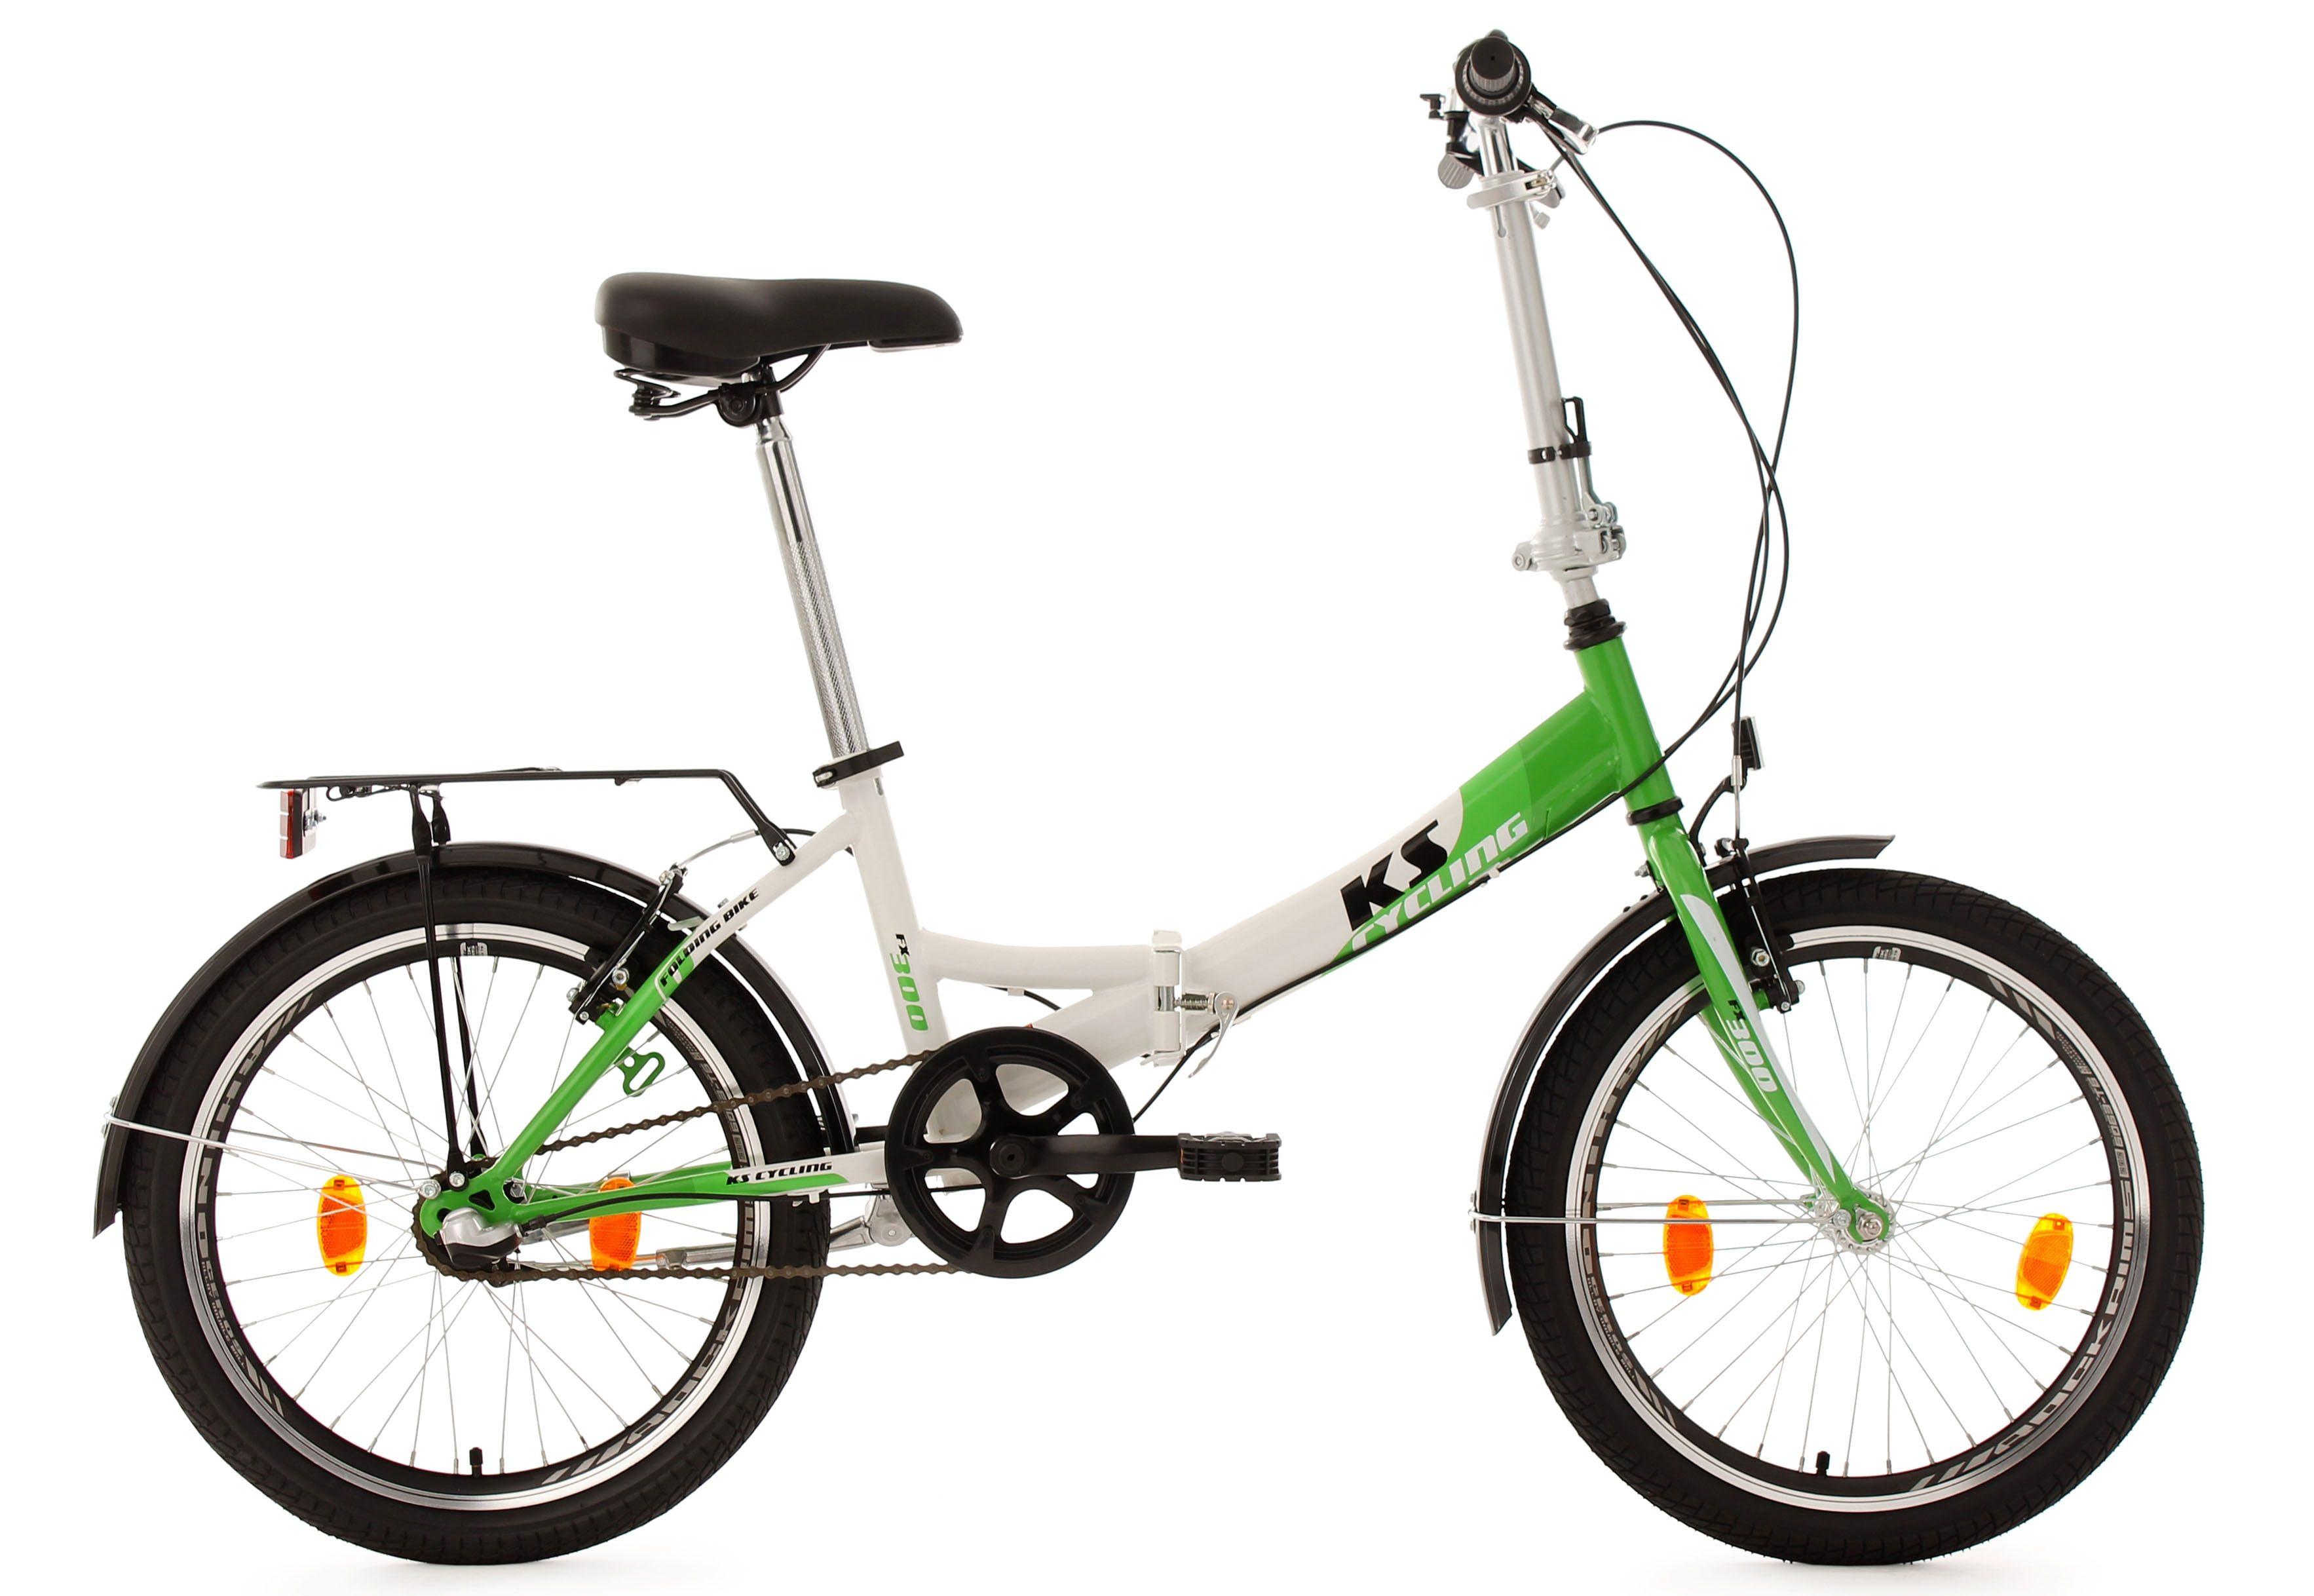 Faltrad, 20 Zoll, 3 Gang-Shimano-Nabenschaltung, weiß-grün, »FX300«, KS Cycling